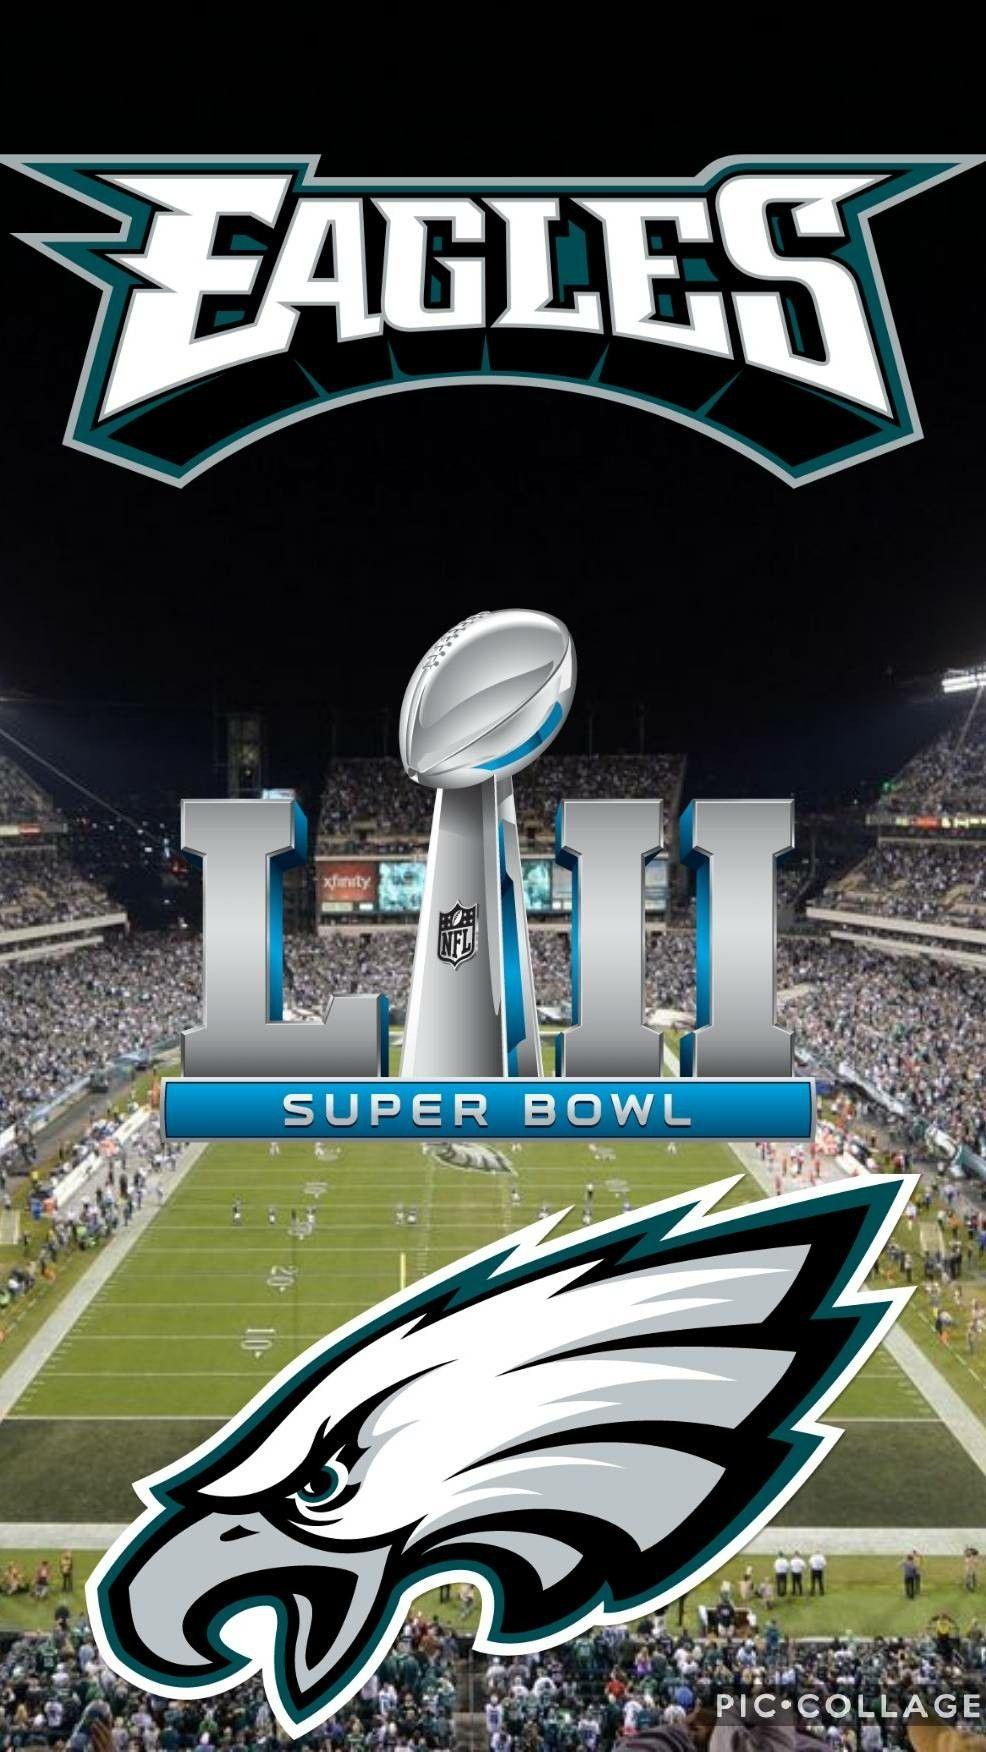 Football Championship For Life Eagles Super Bowl Eagles Philadelphia Eagles Super Bowl